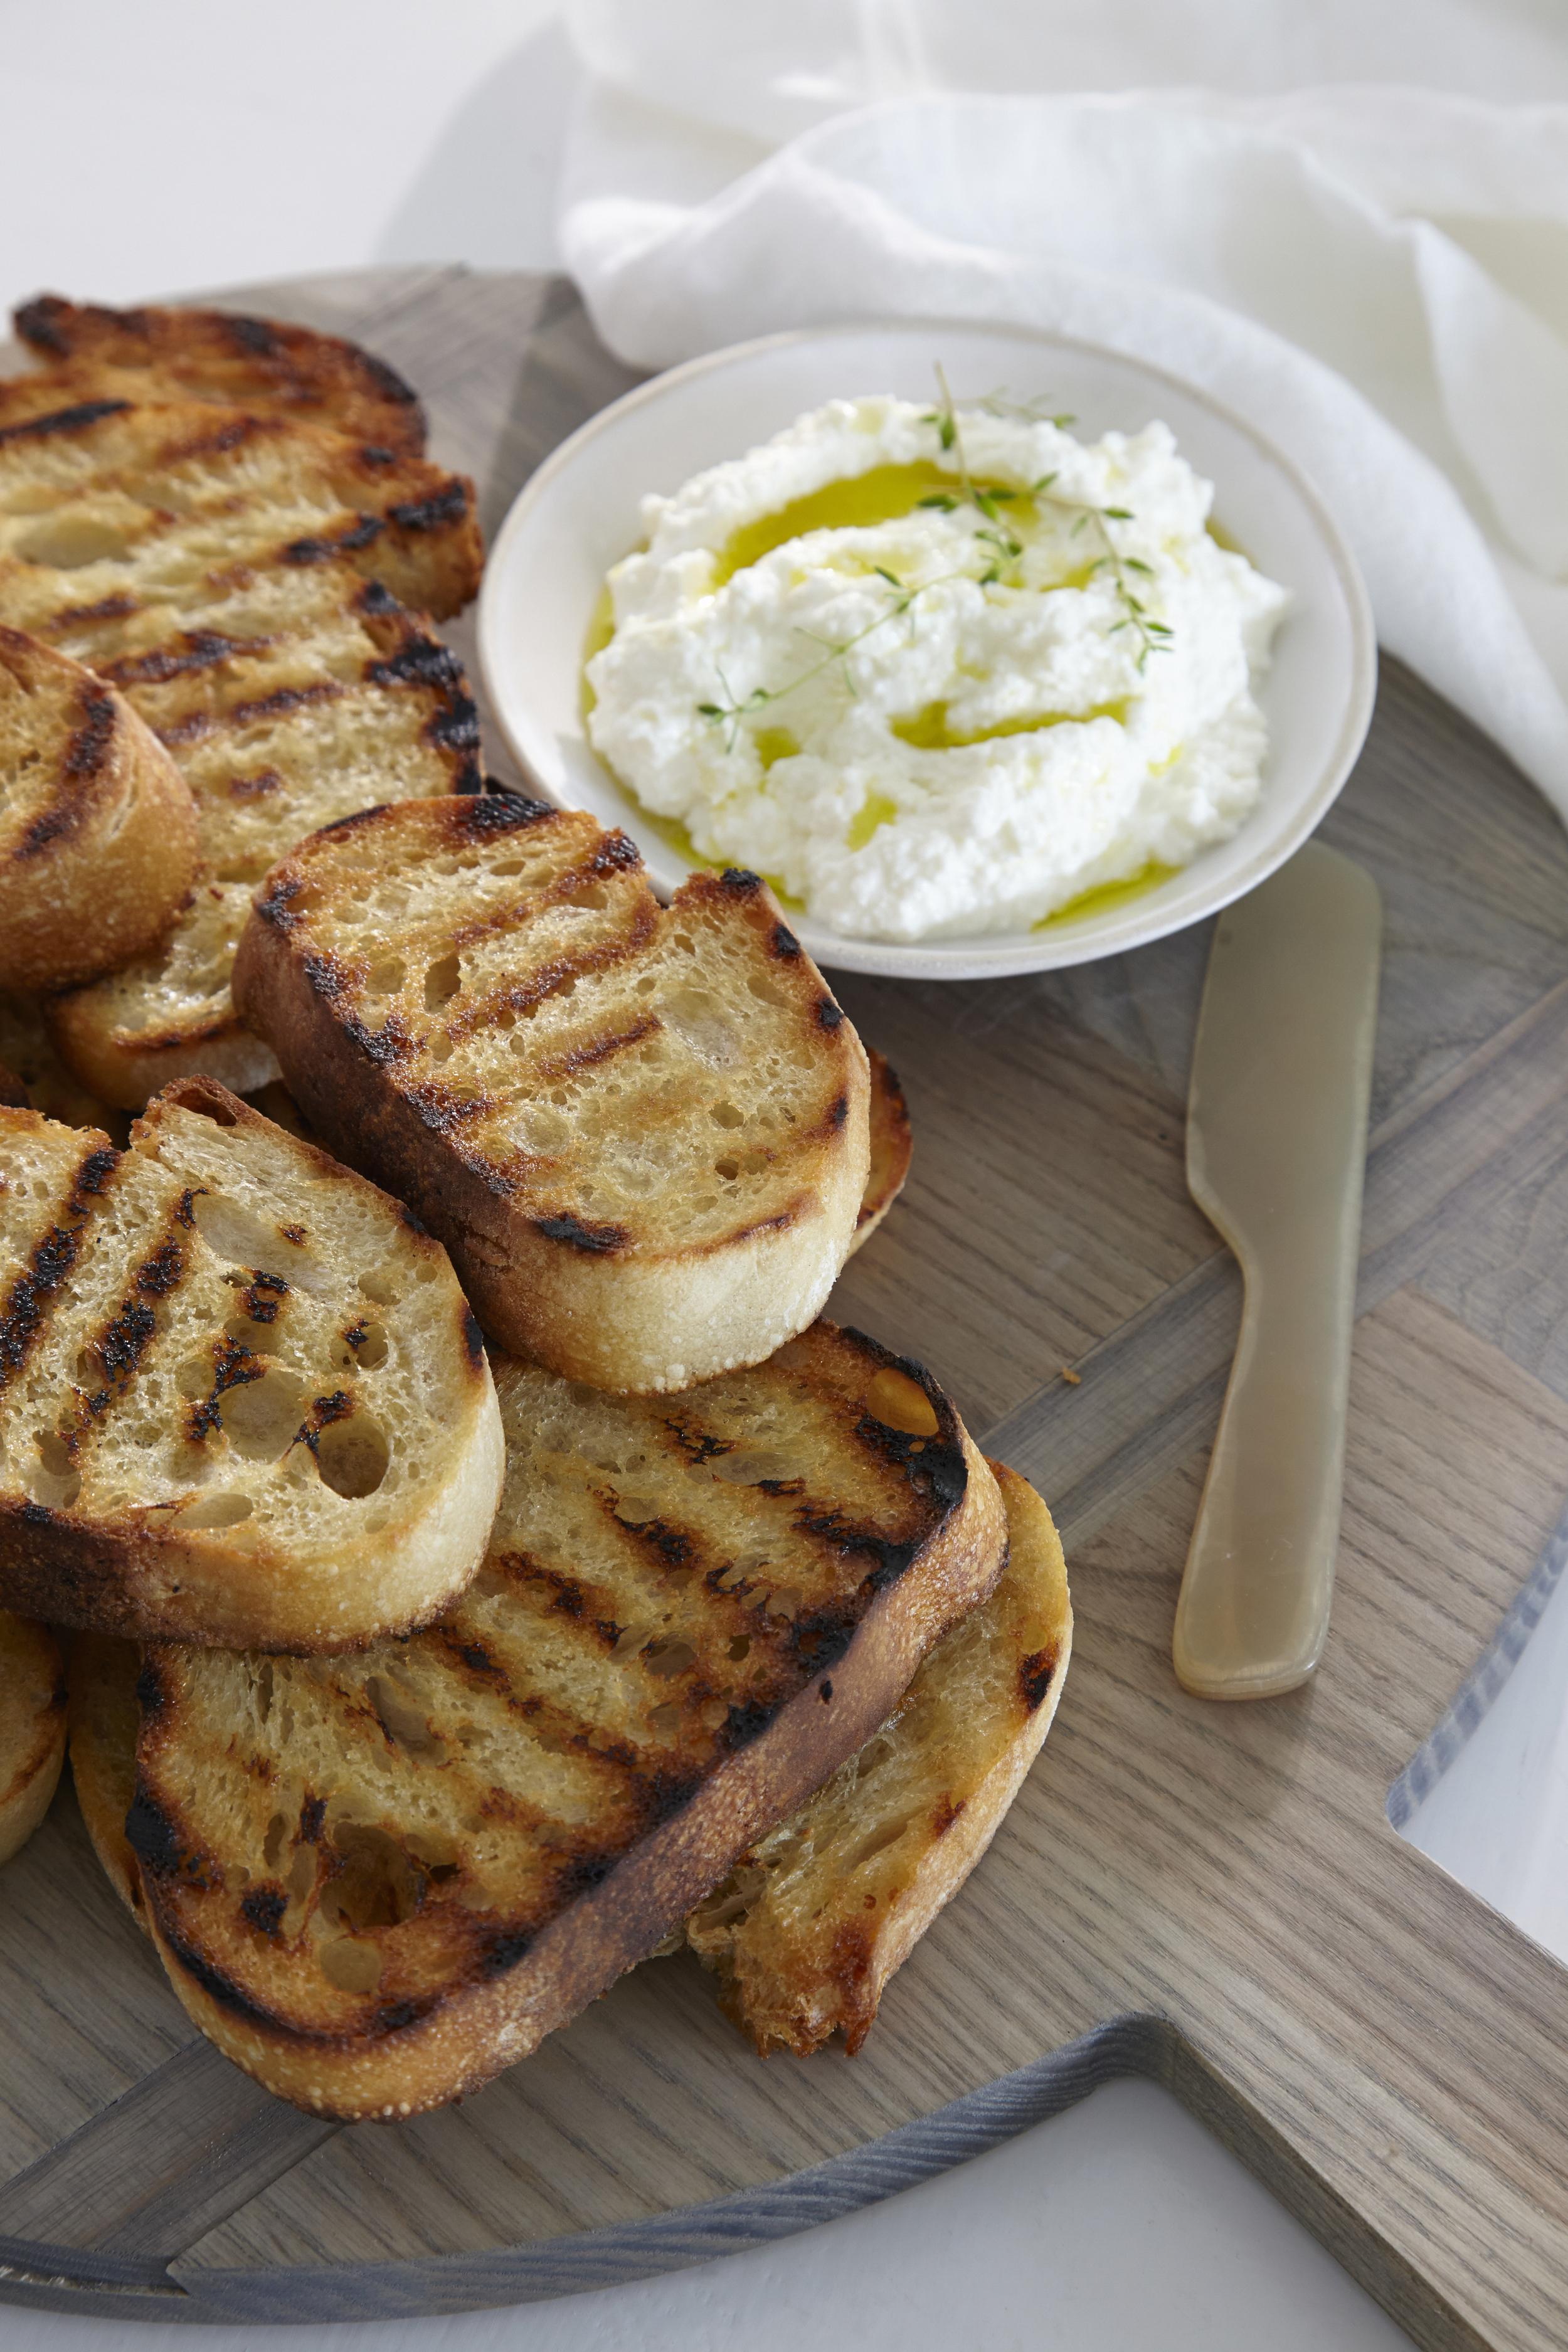 grilled bread-ricotta-serving board.jpg